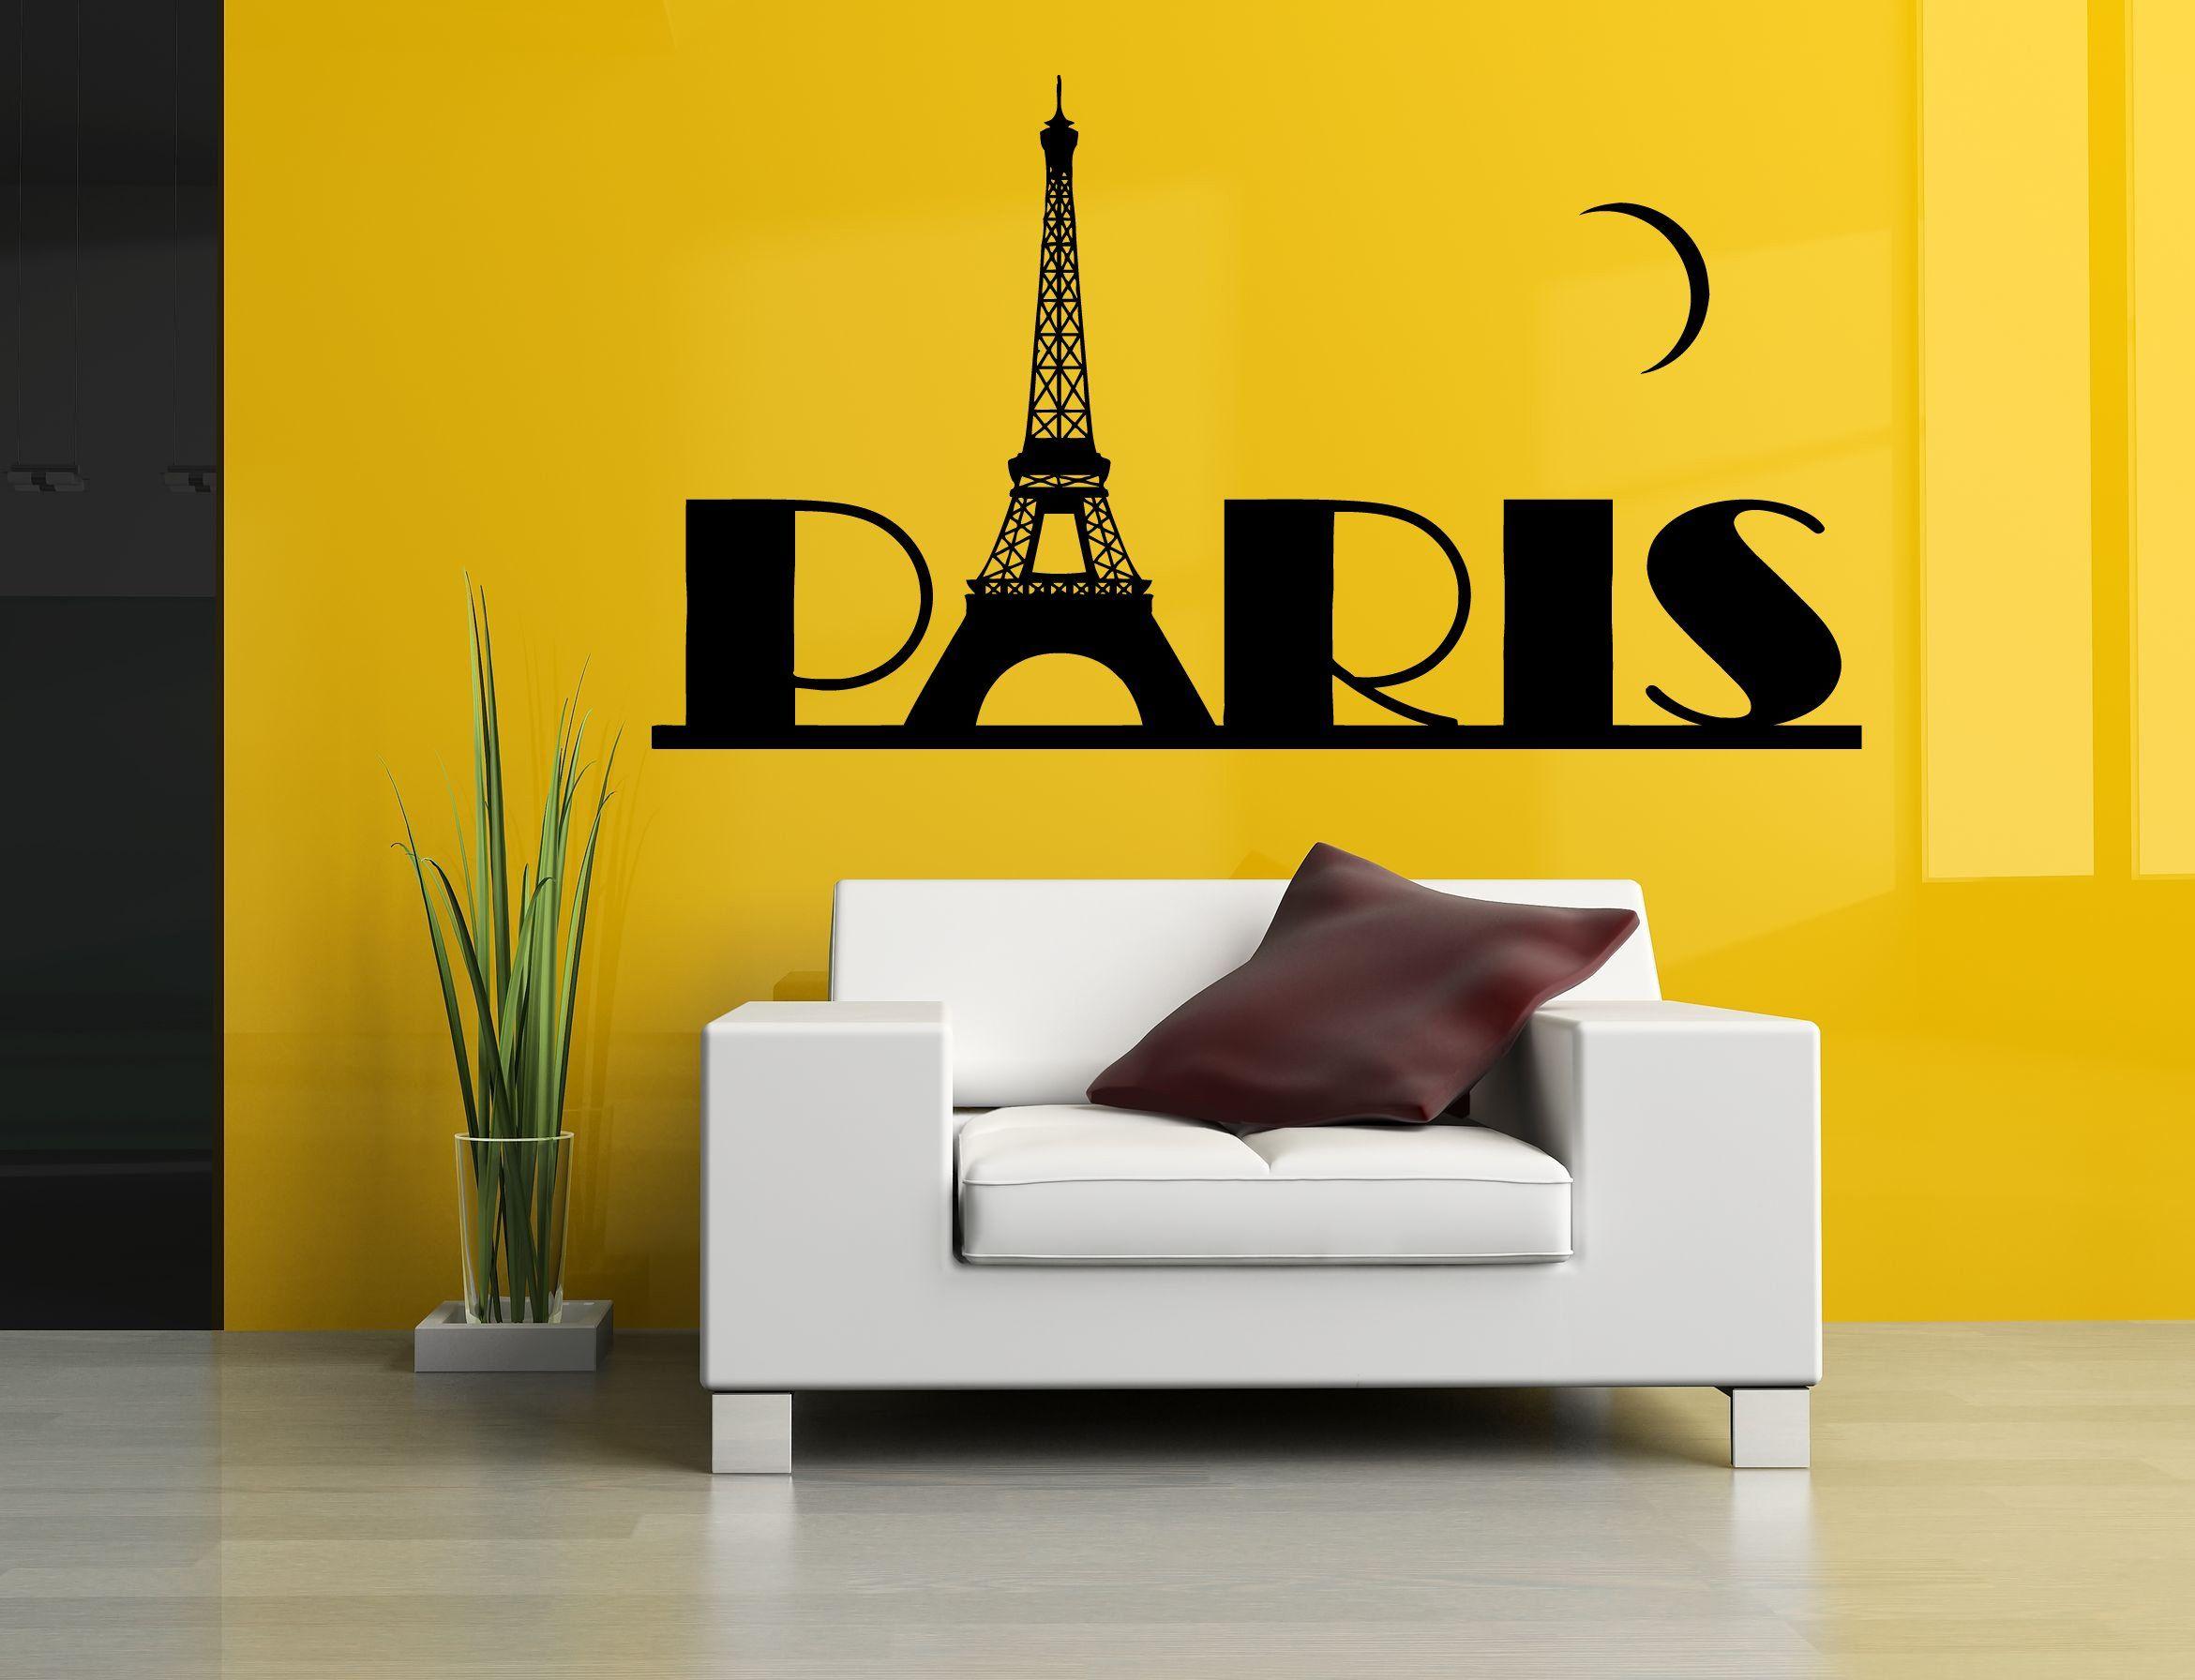 Wall Room Decor Art Vinyl Sticker Mural Decal Paris France Word Big ...